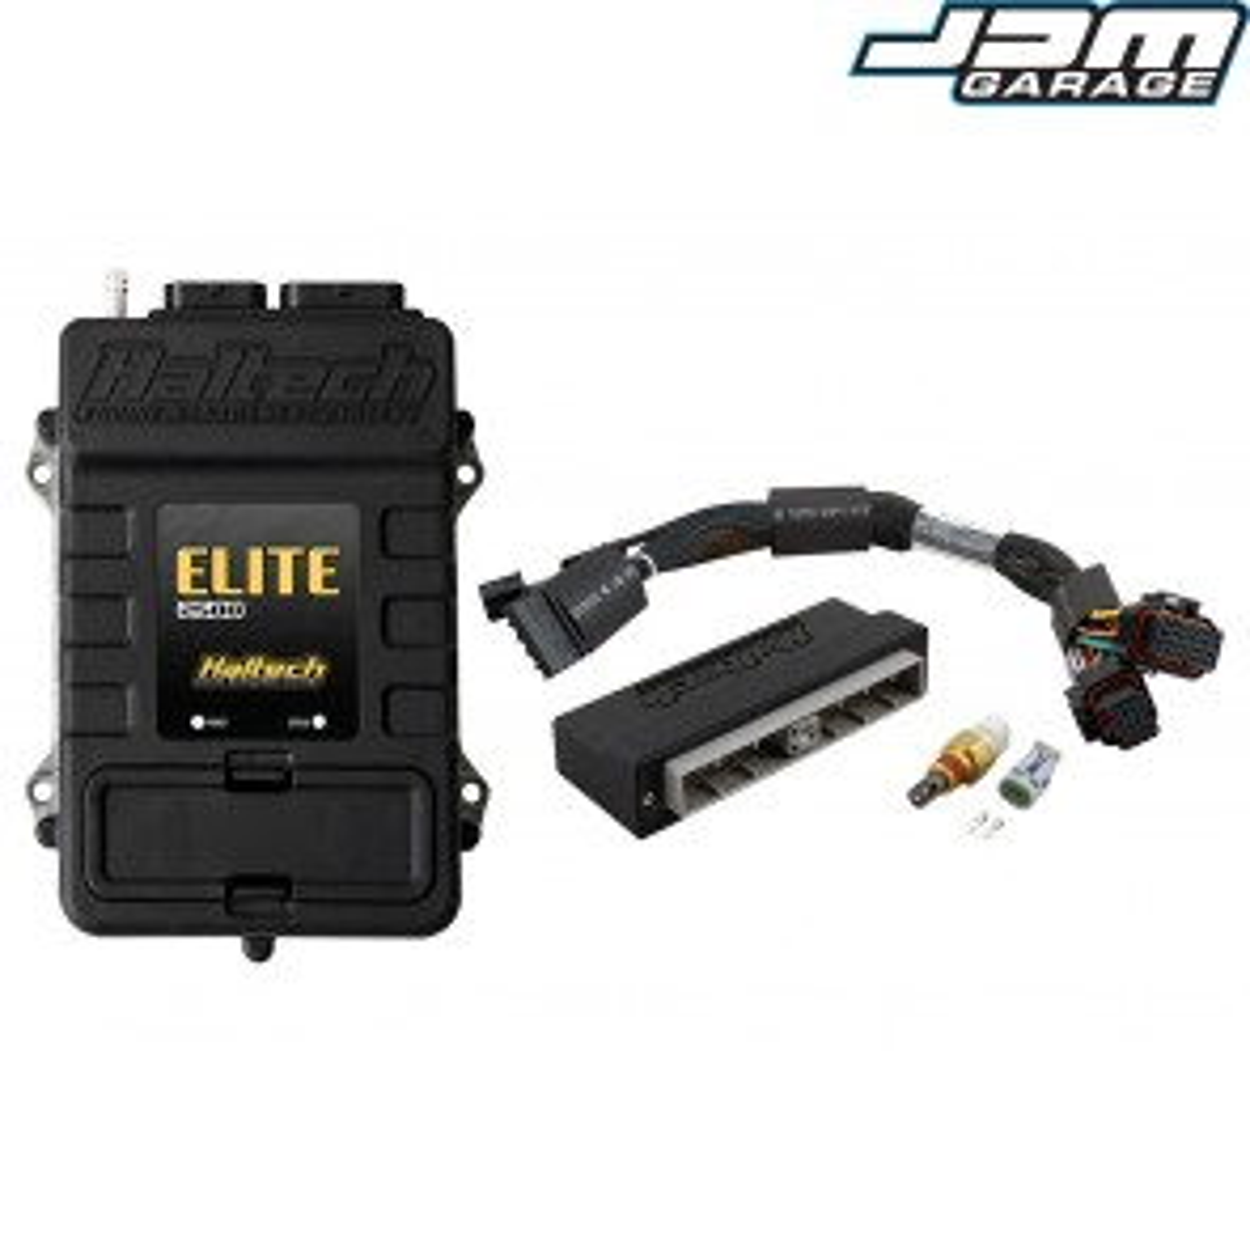 Haltech Elite 2500+ ECU Nissan Skyline R34 GT-T & Stagea WC34 With Plug 'n' Play Adaptor Harness Kit